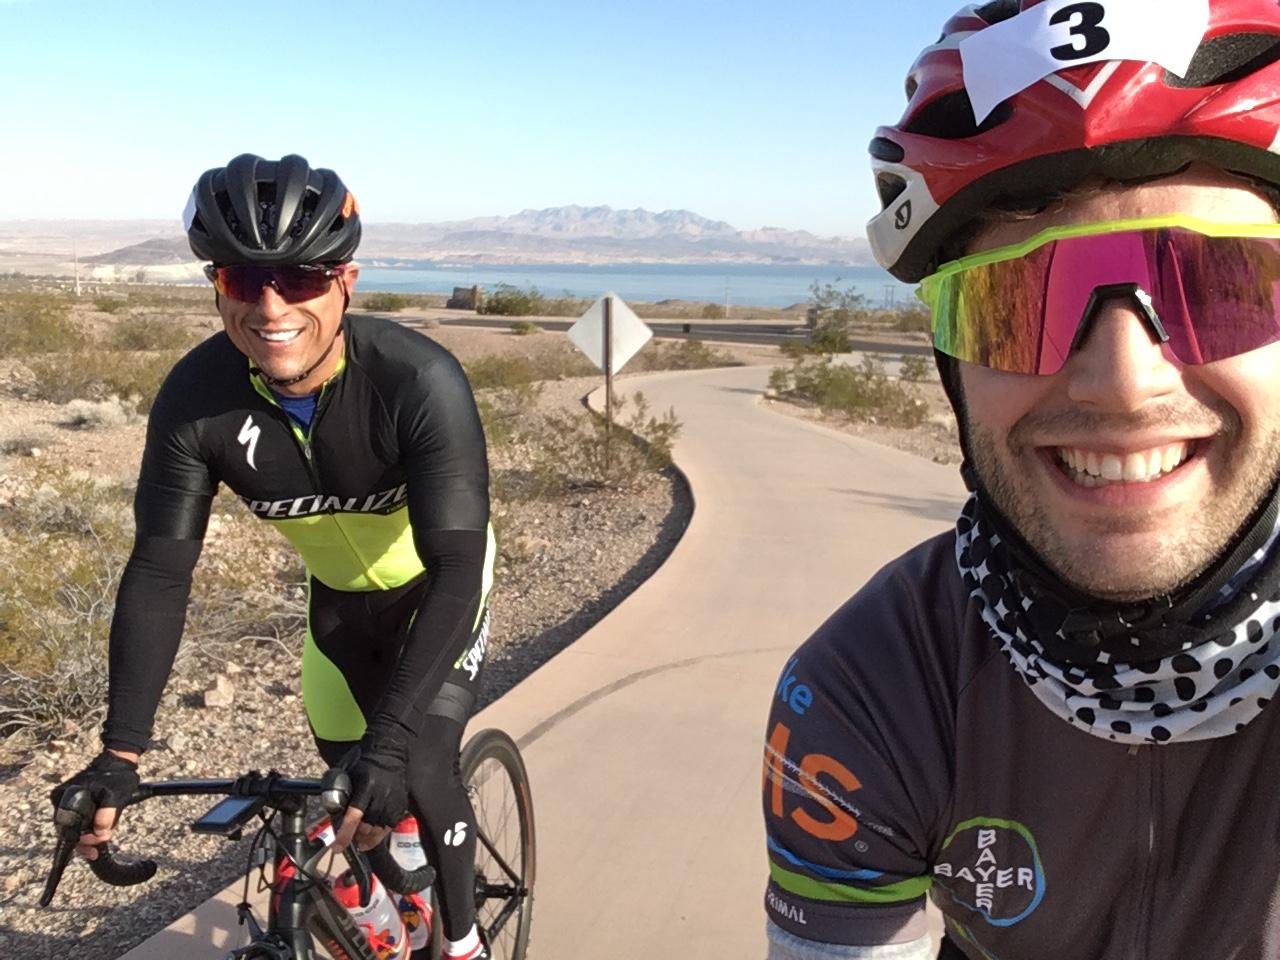 Bike for the Bleeding Disorders Community!